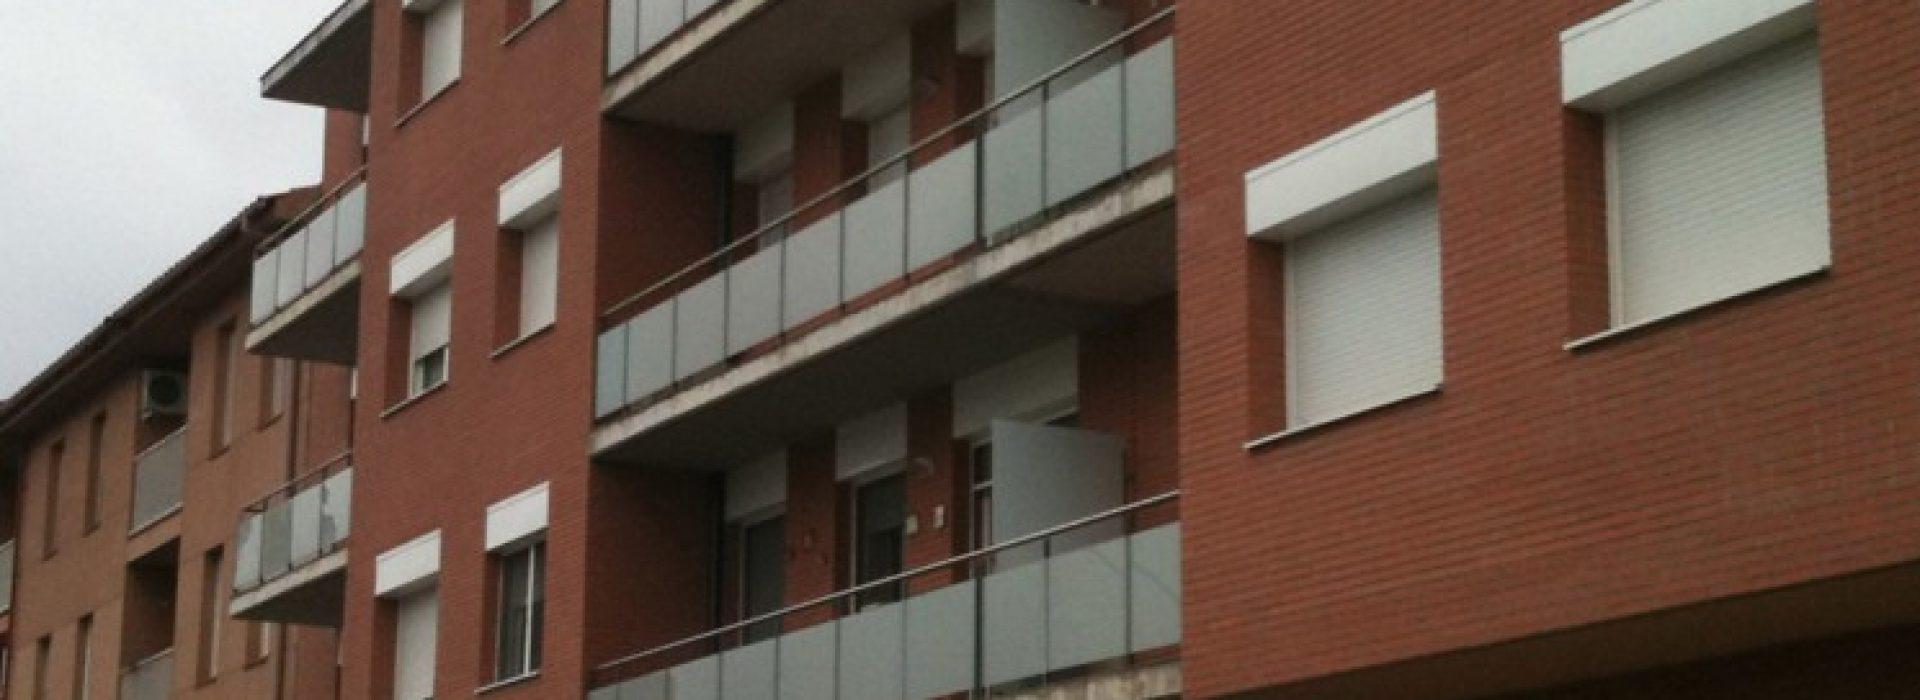 igualada-residencial-35